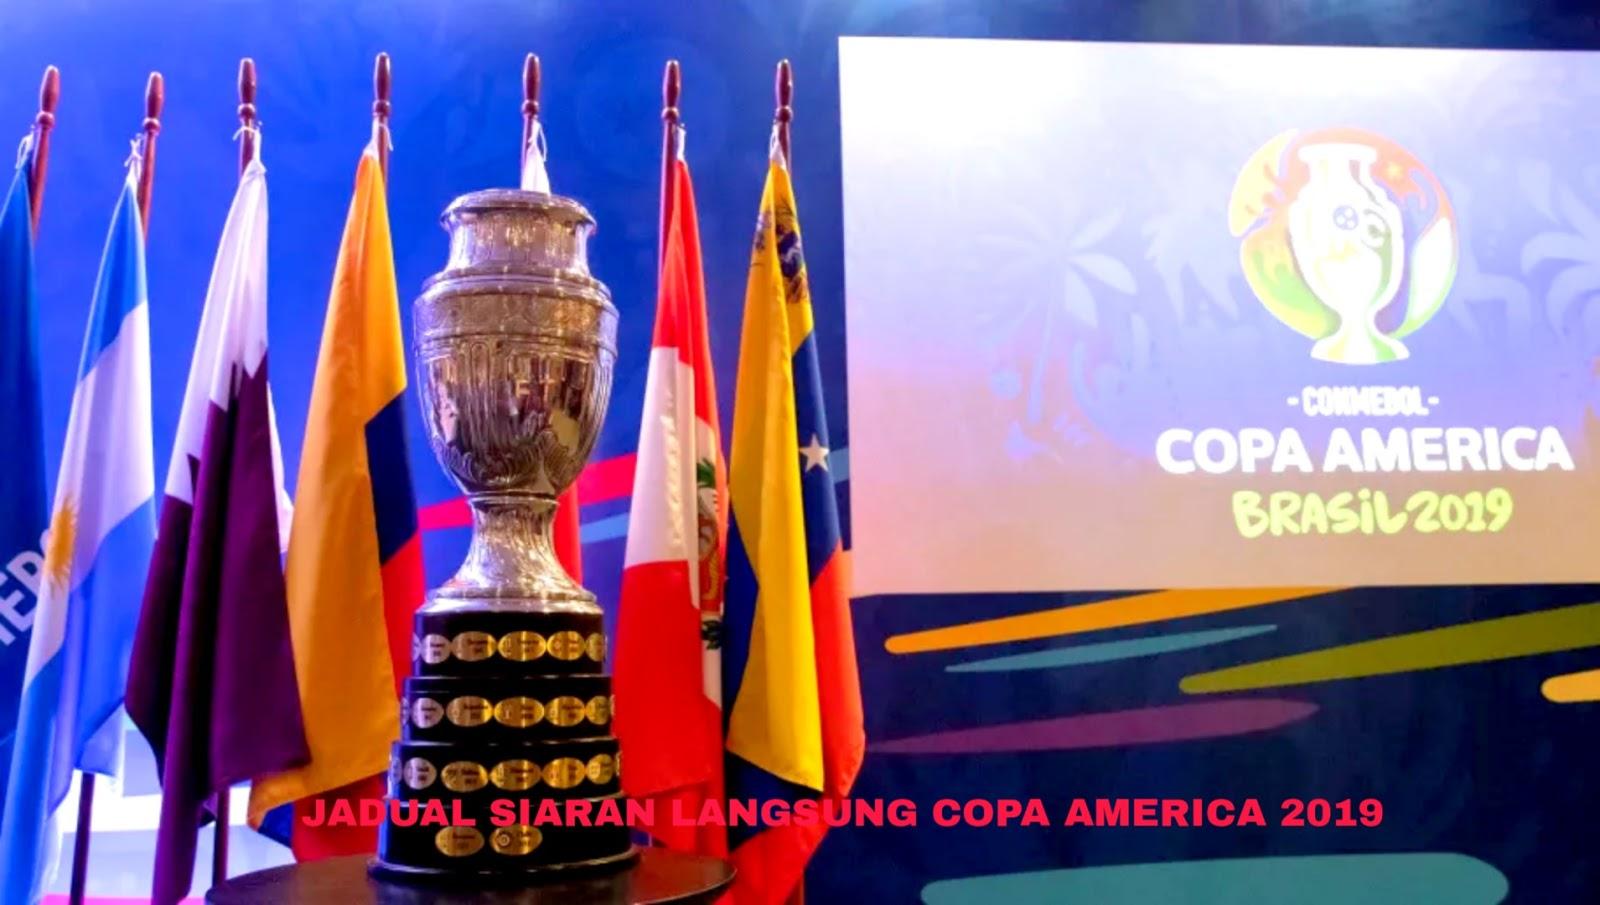 Jadual Siaran Langsung Copa America 2019 (Waktu Malaysia)